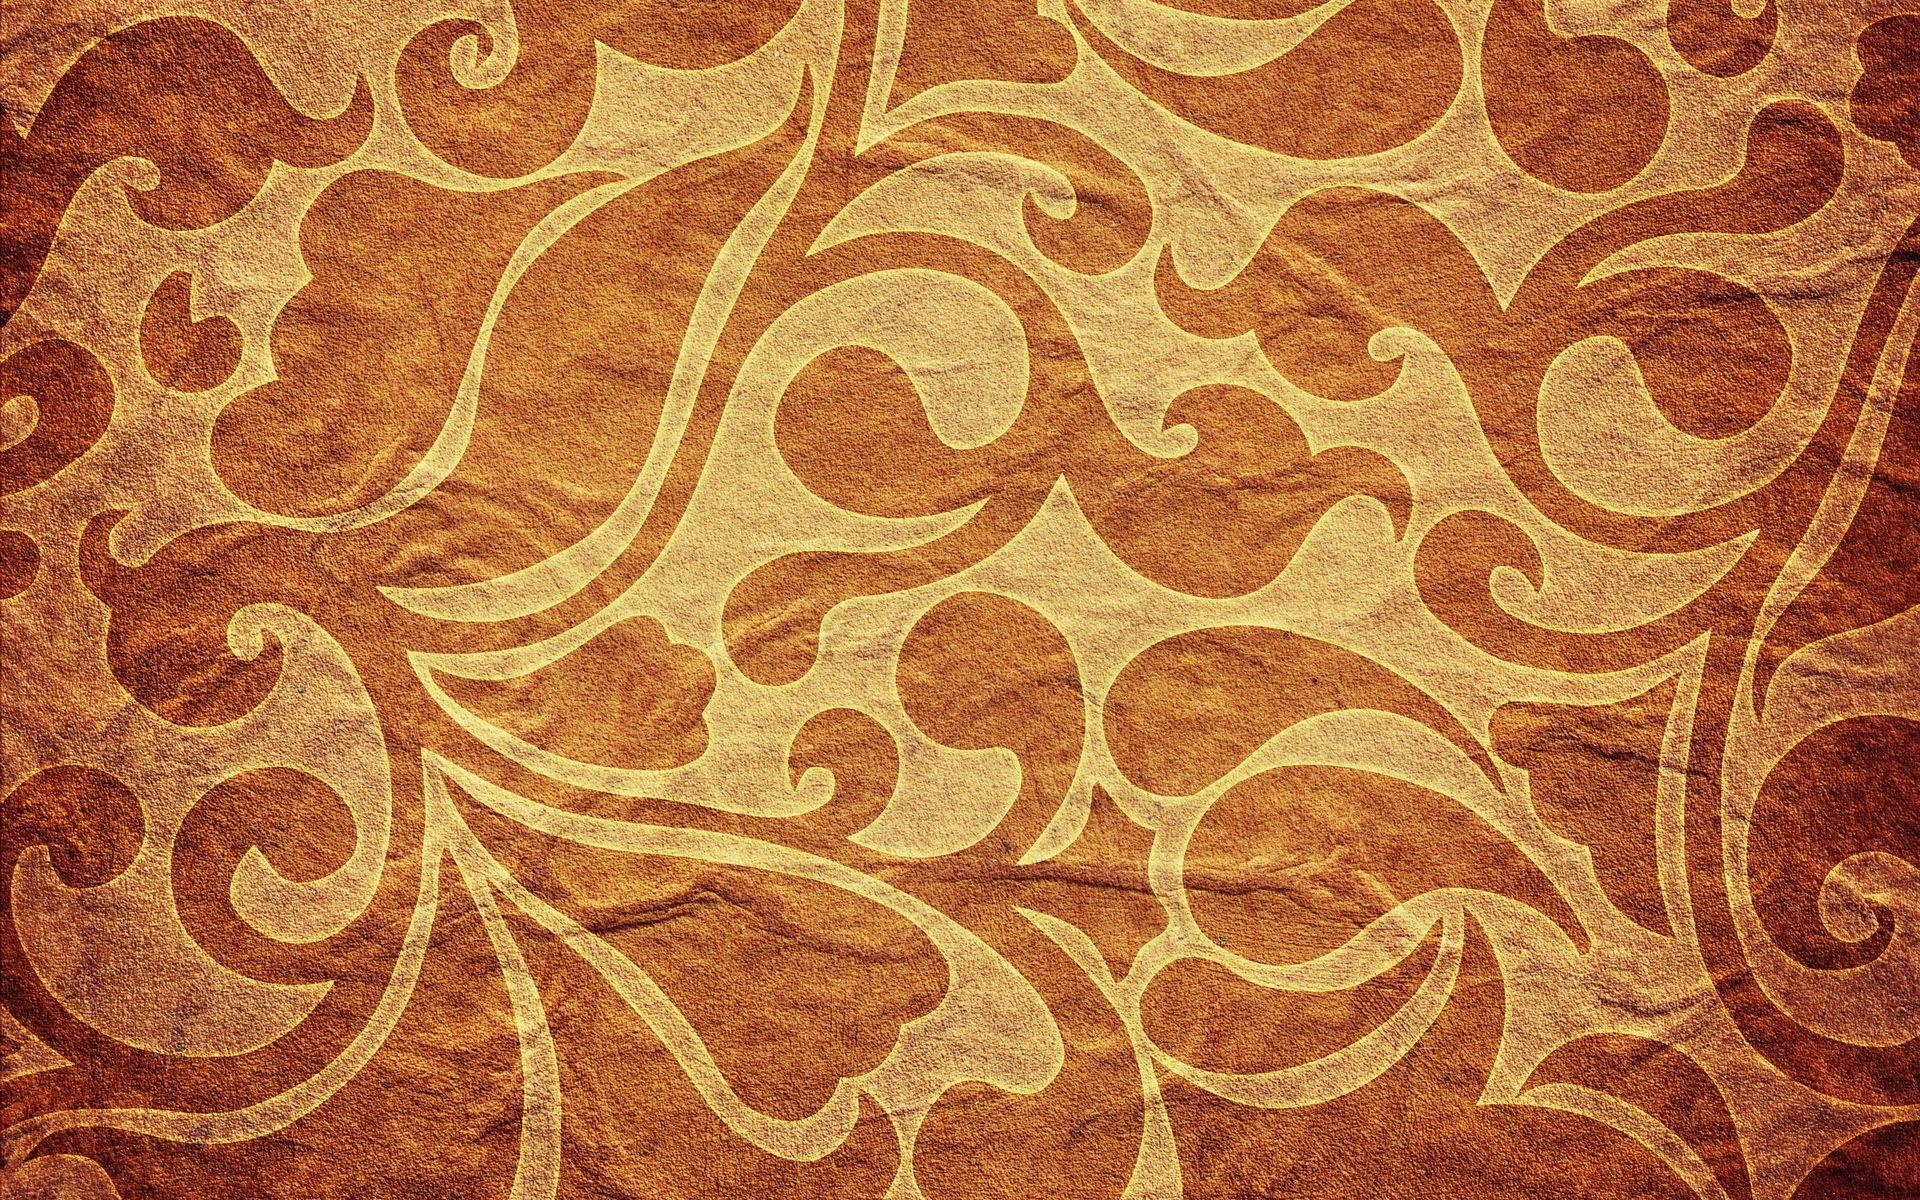 Brown Wallpaper Hd Background Texture Textured Background Artistic Wallpaper Textured Wallpaper